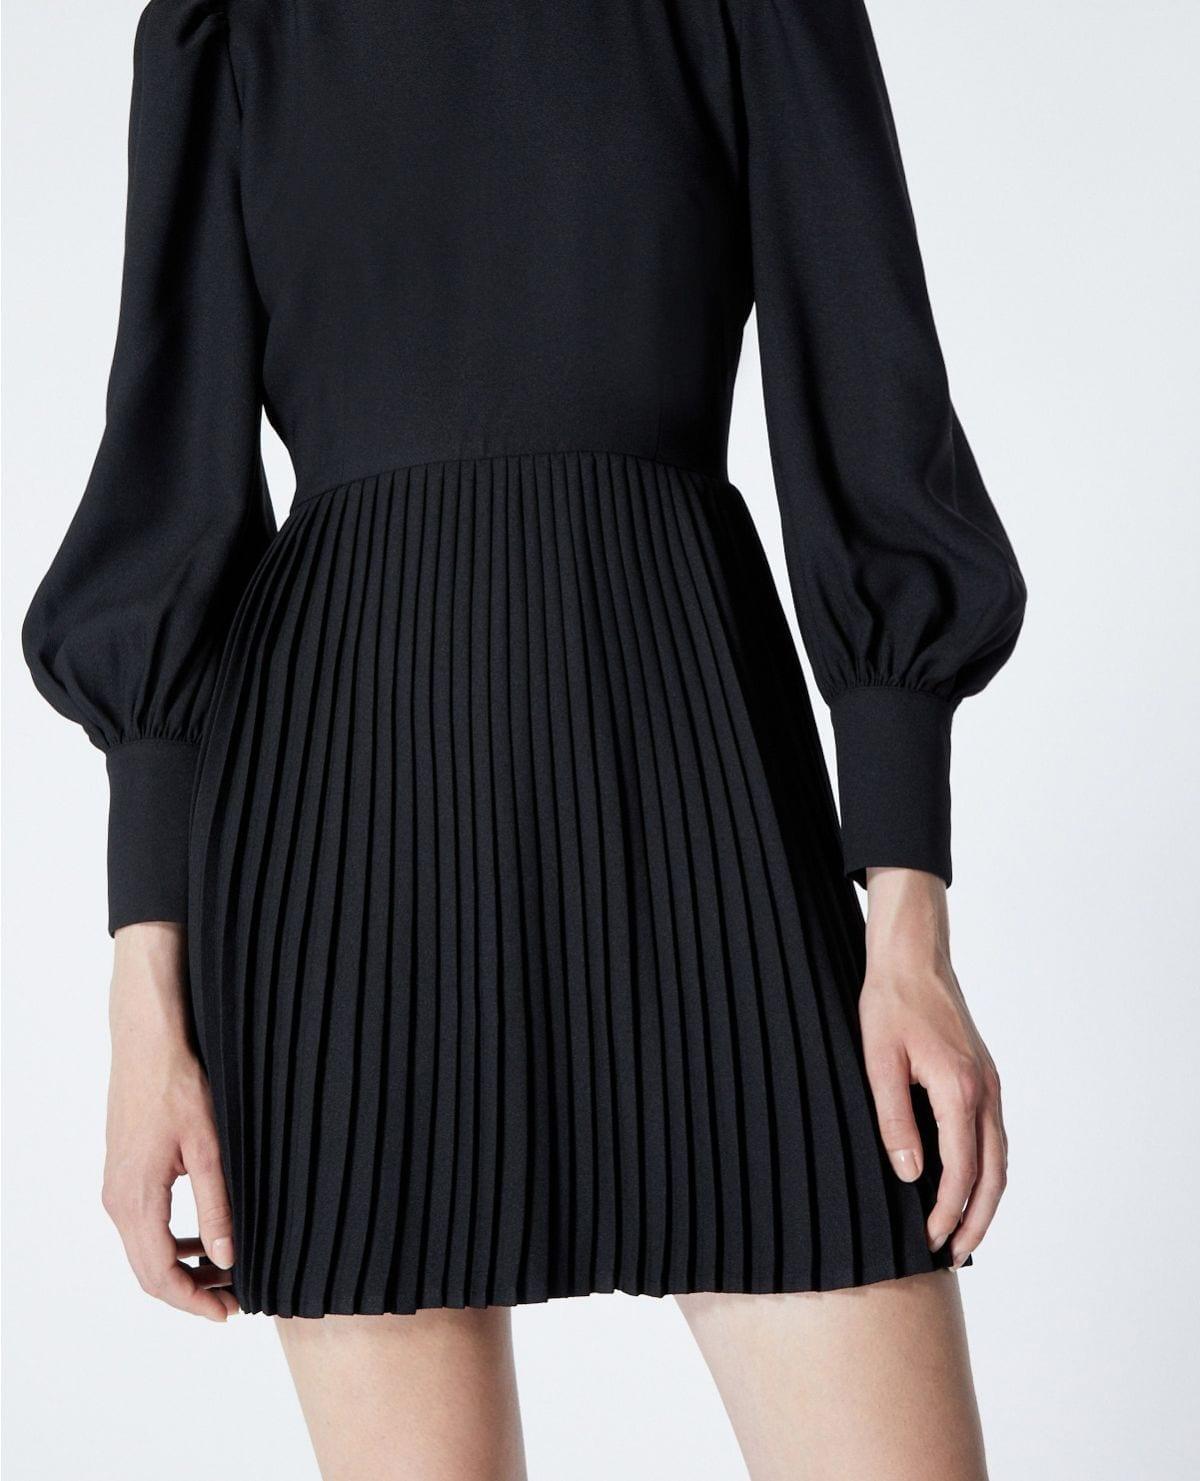 THE KOOPLES Short Pleated Black Dress